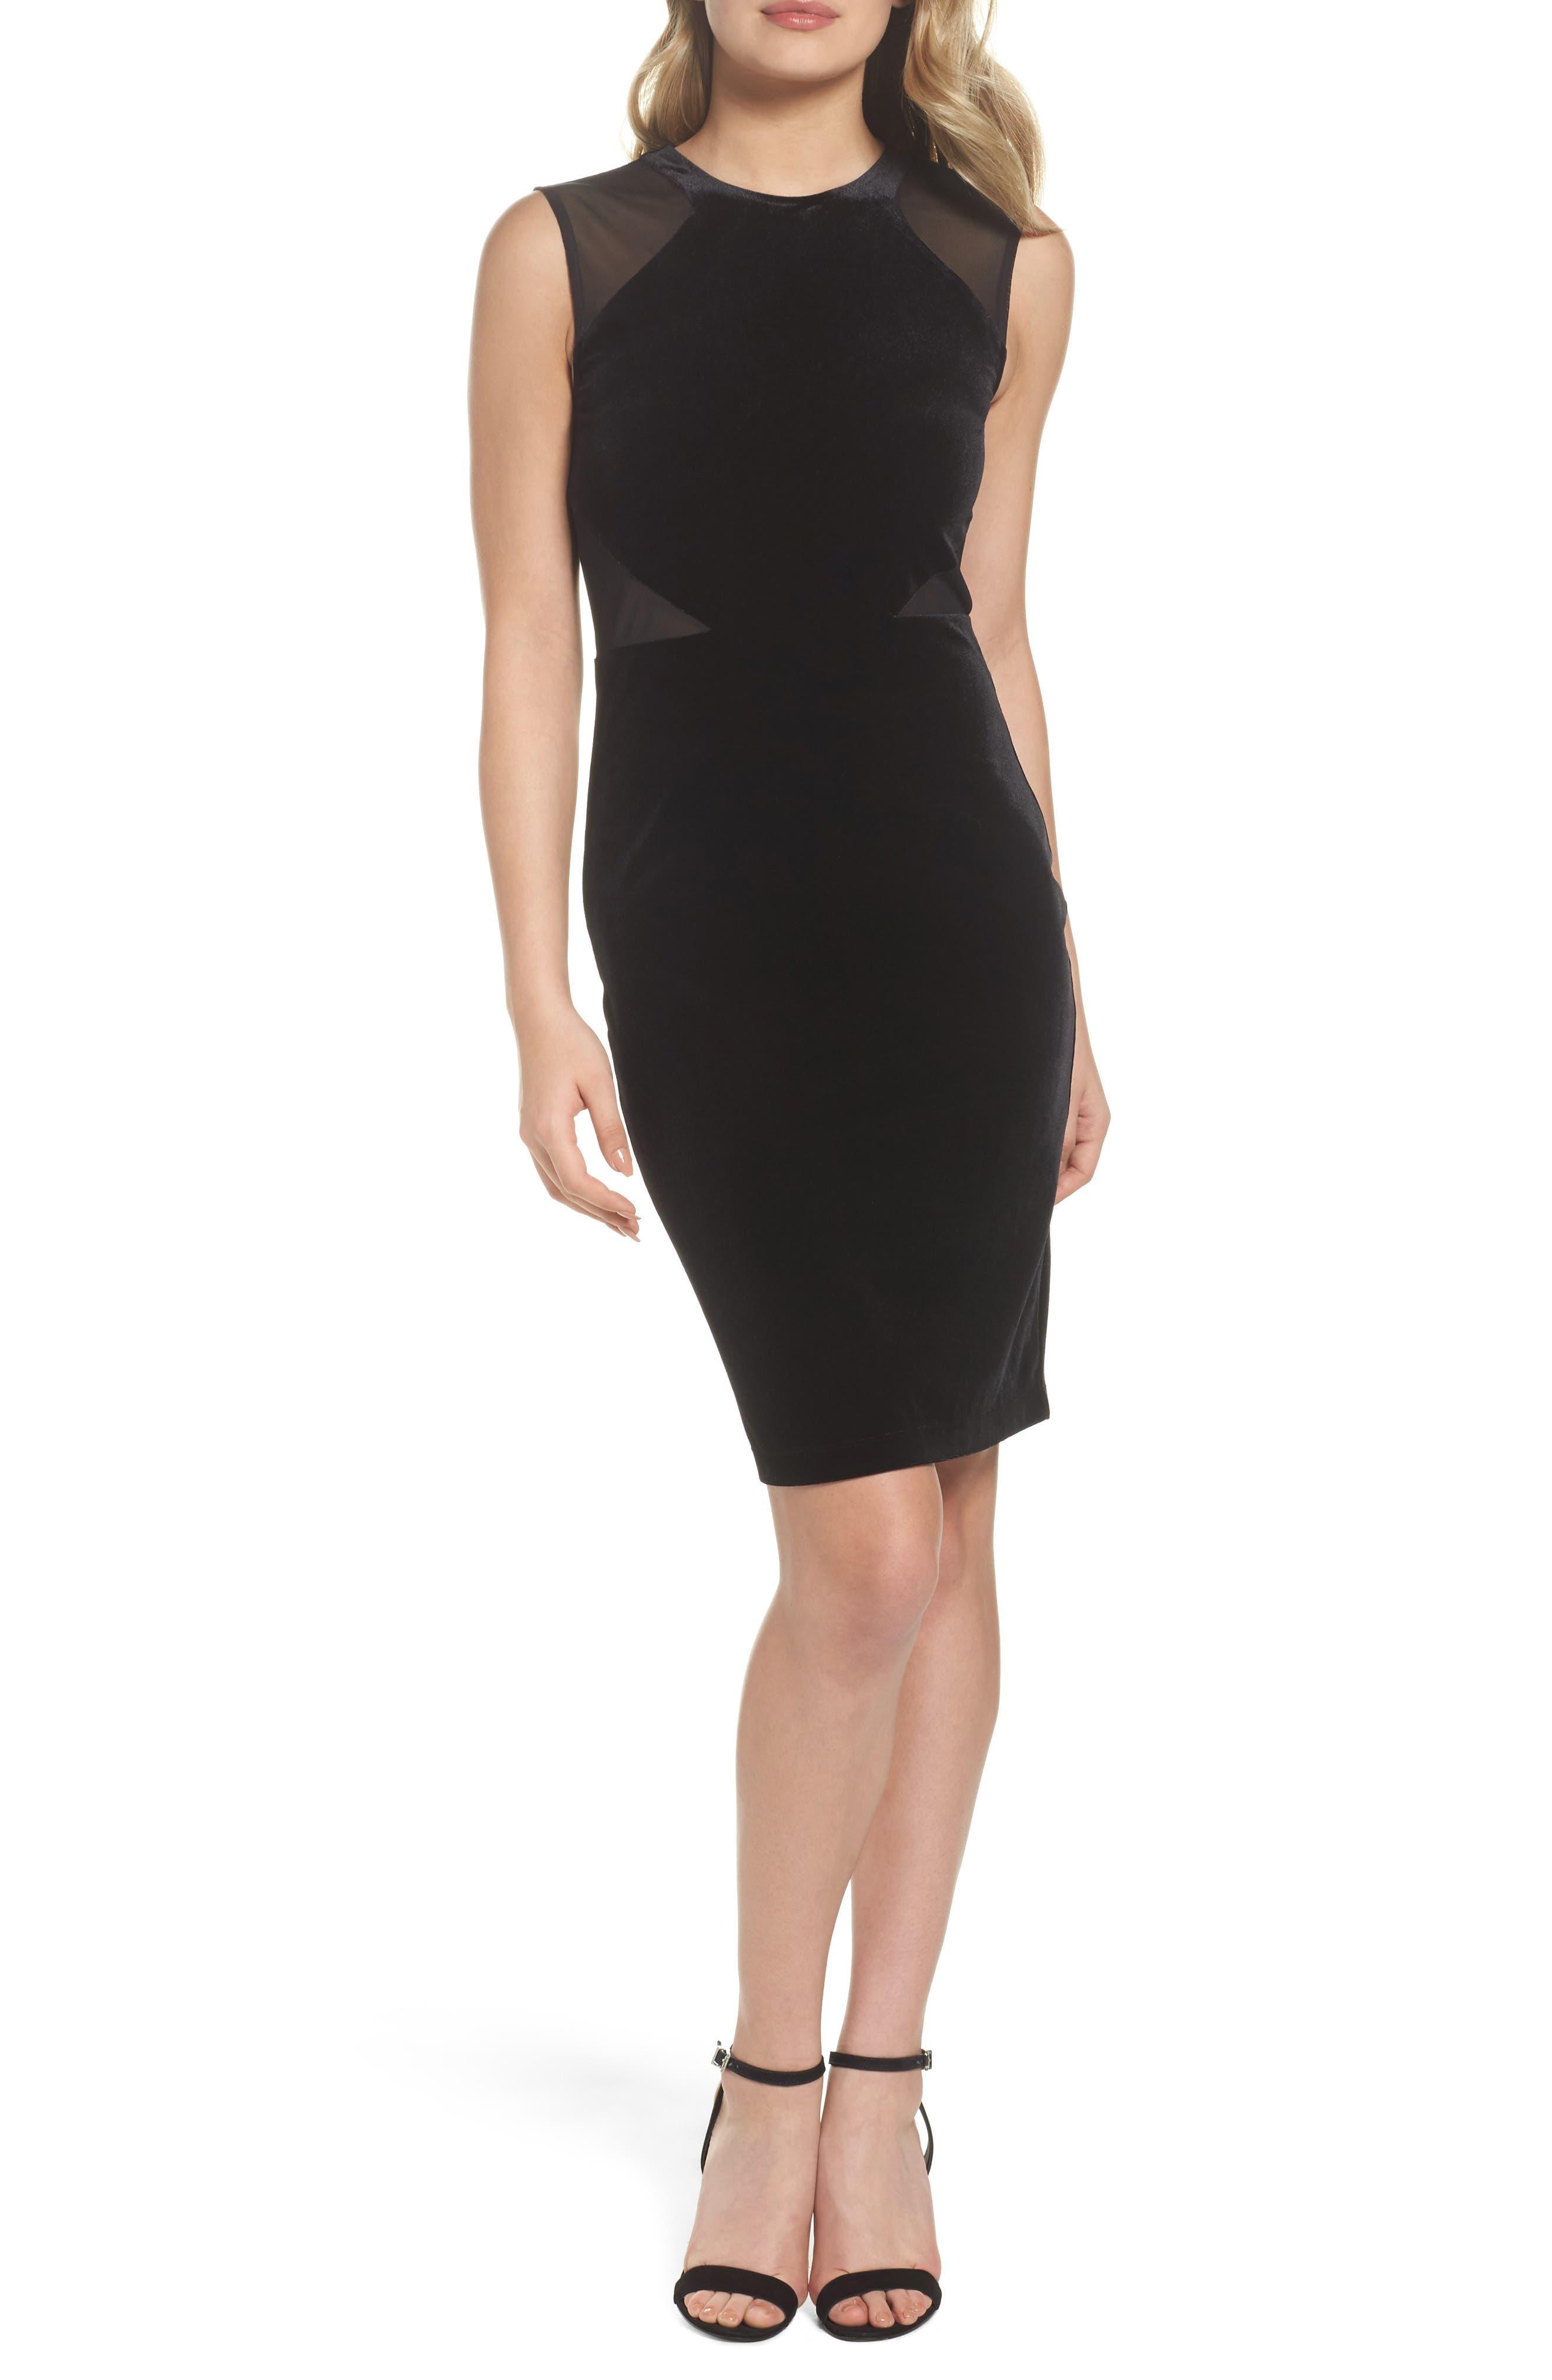 Viven Velvet Body-Con Dress,                             Main thumbnail 1, color,                             Black/ Black